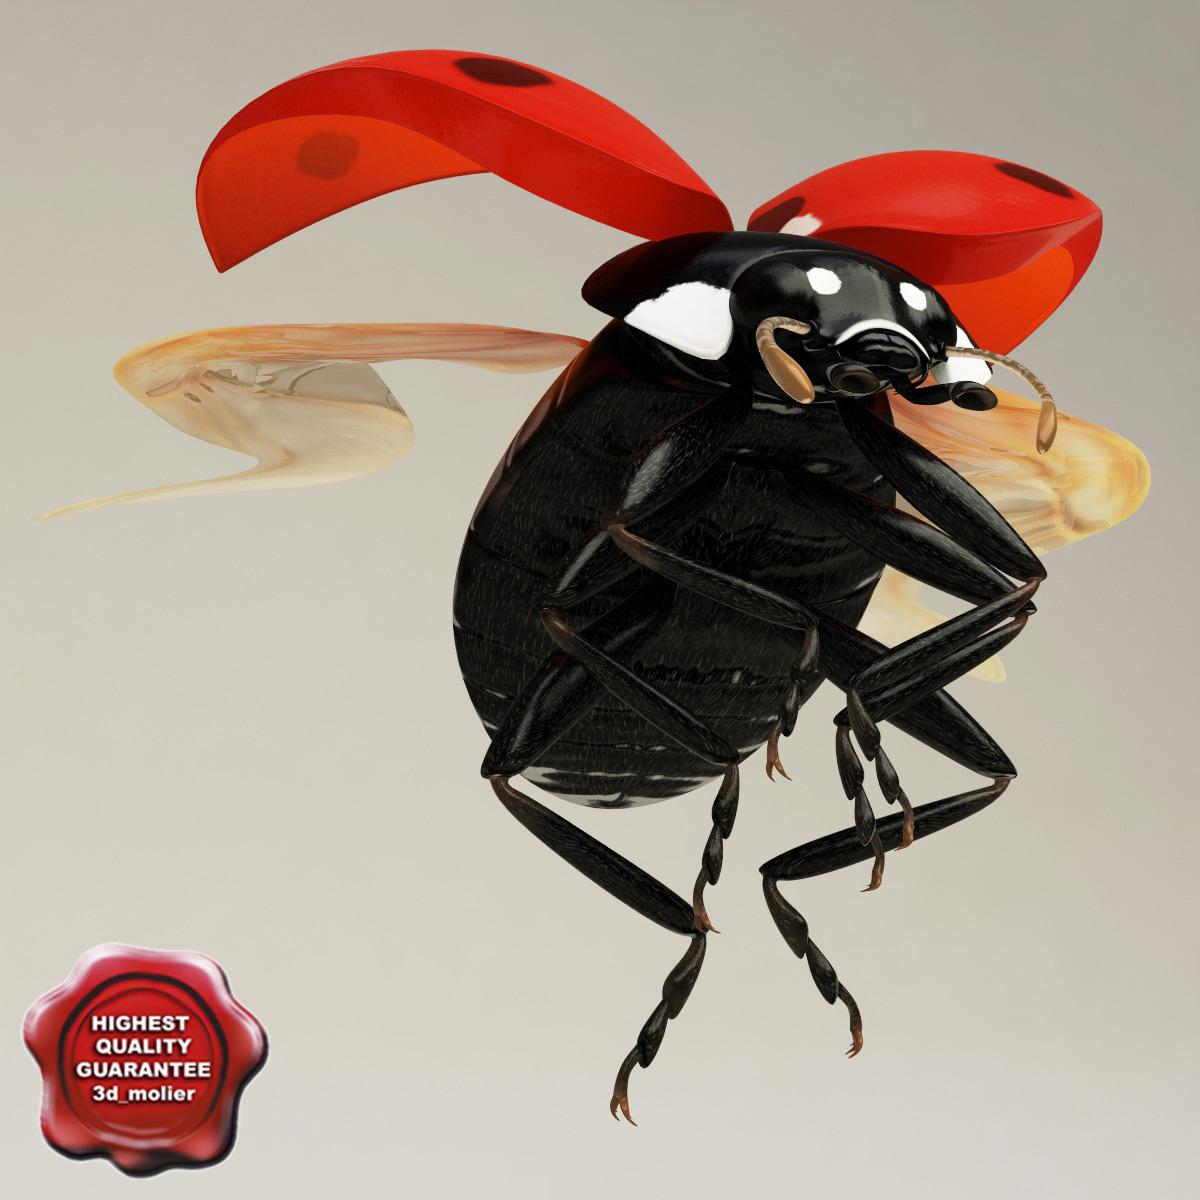 Ladybug_Pose2_00.jpg